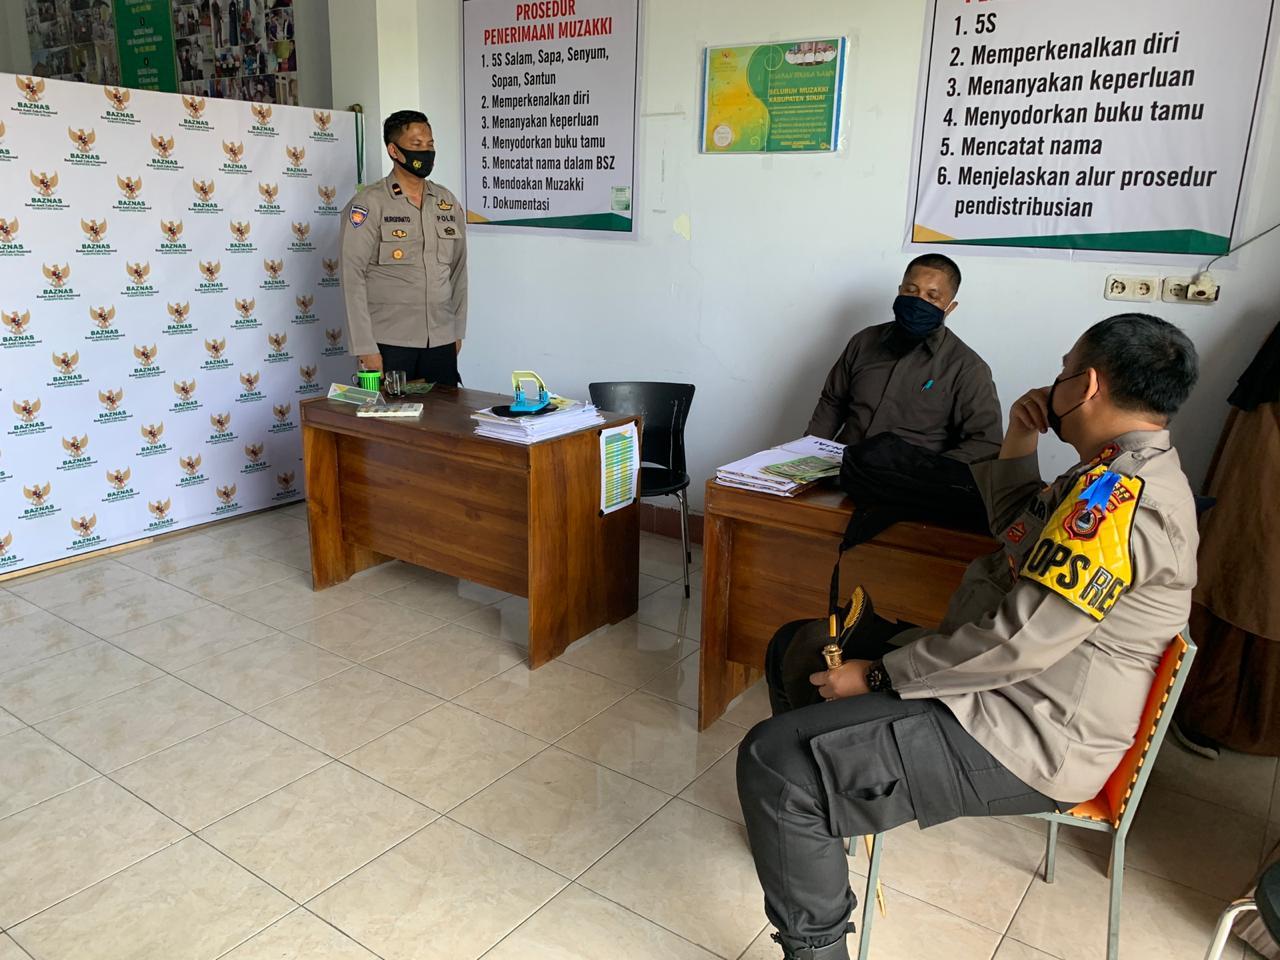 Kapolres Sinjai Tiap Bulan Serahkan Zakat Profesi Personel ke Baznas